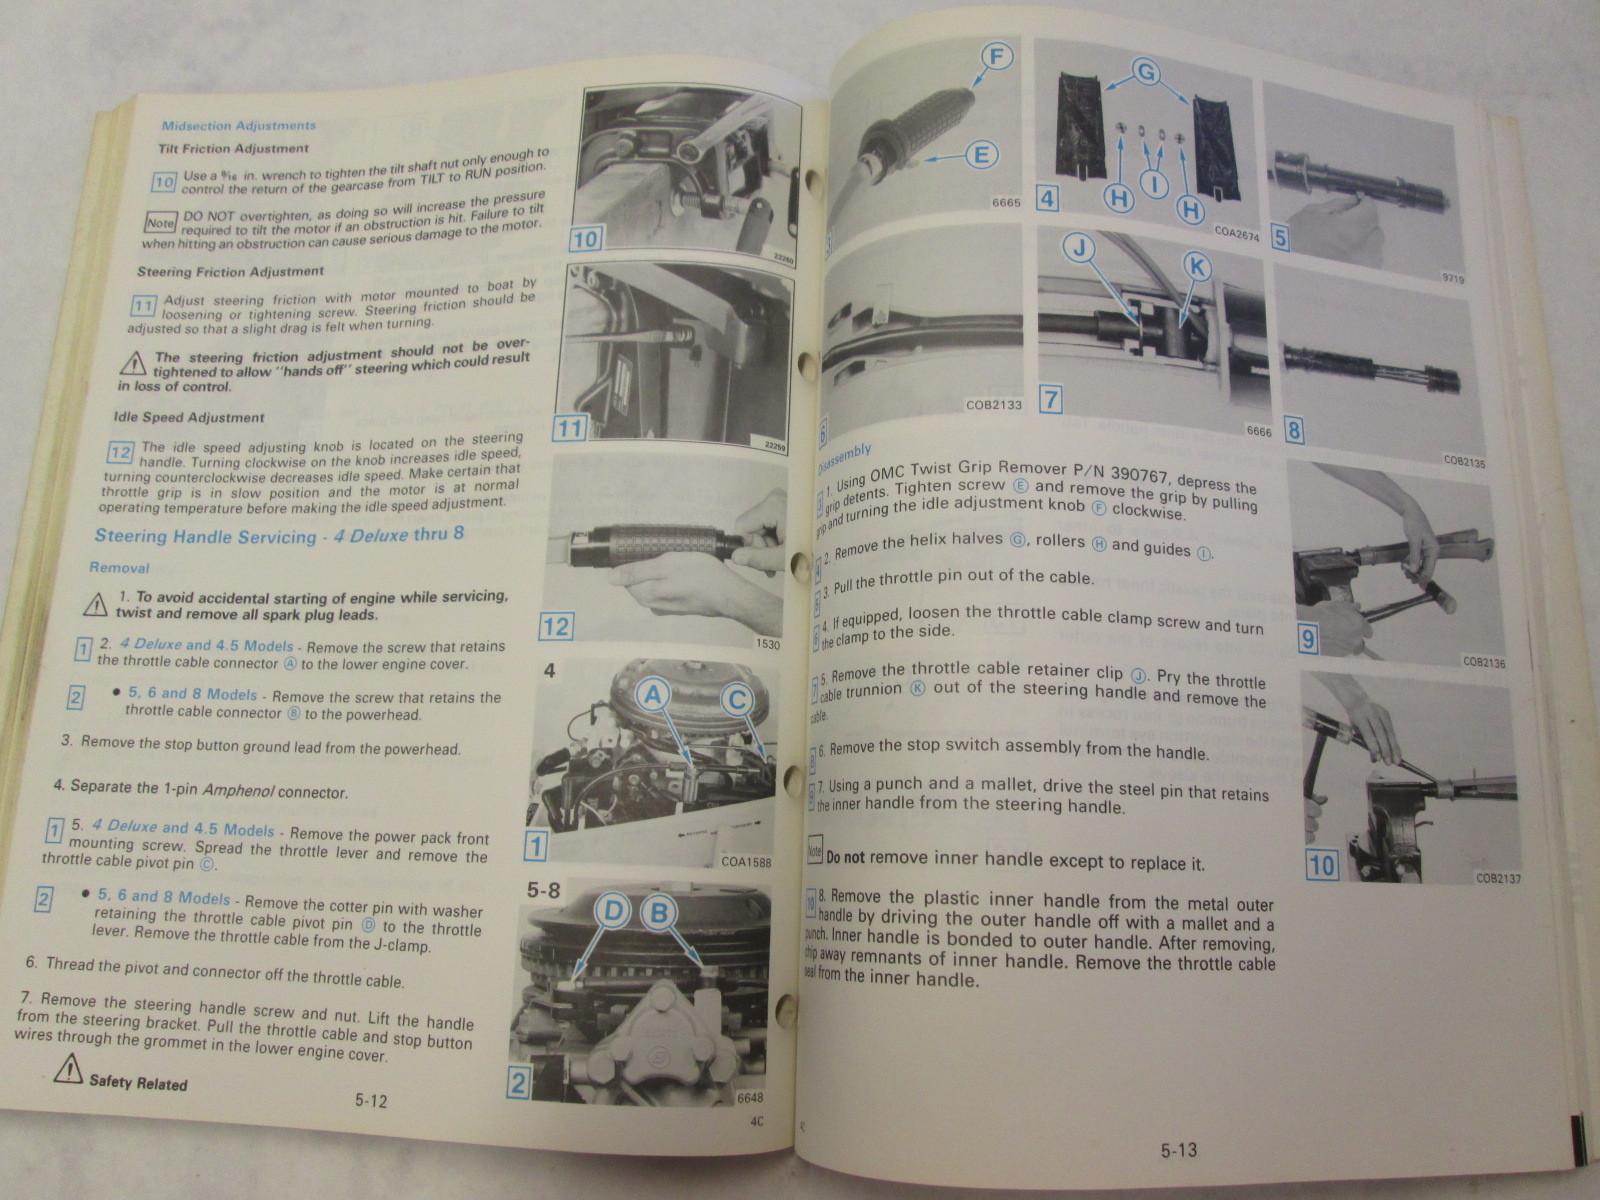 ... 1990 Evinrude Johnson Outboard Service Manual 3-8 HP ES Colt Junior